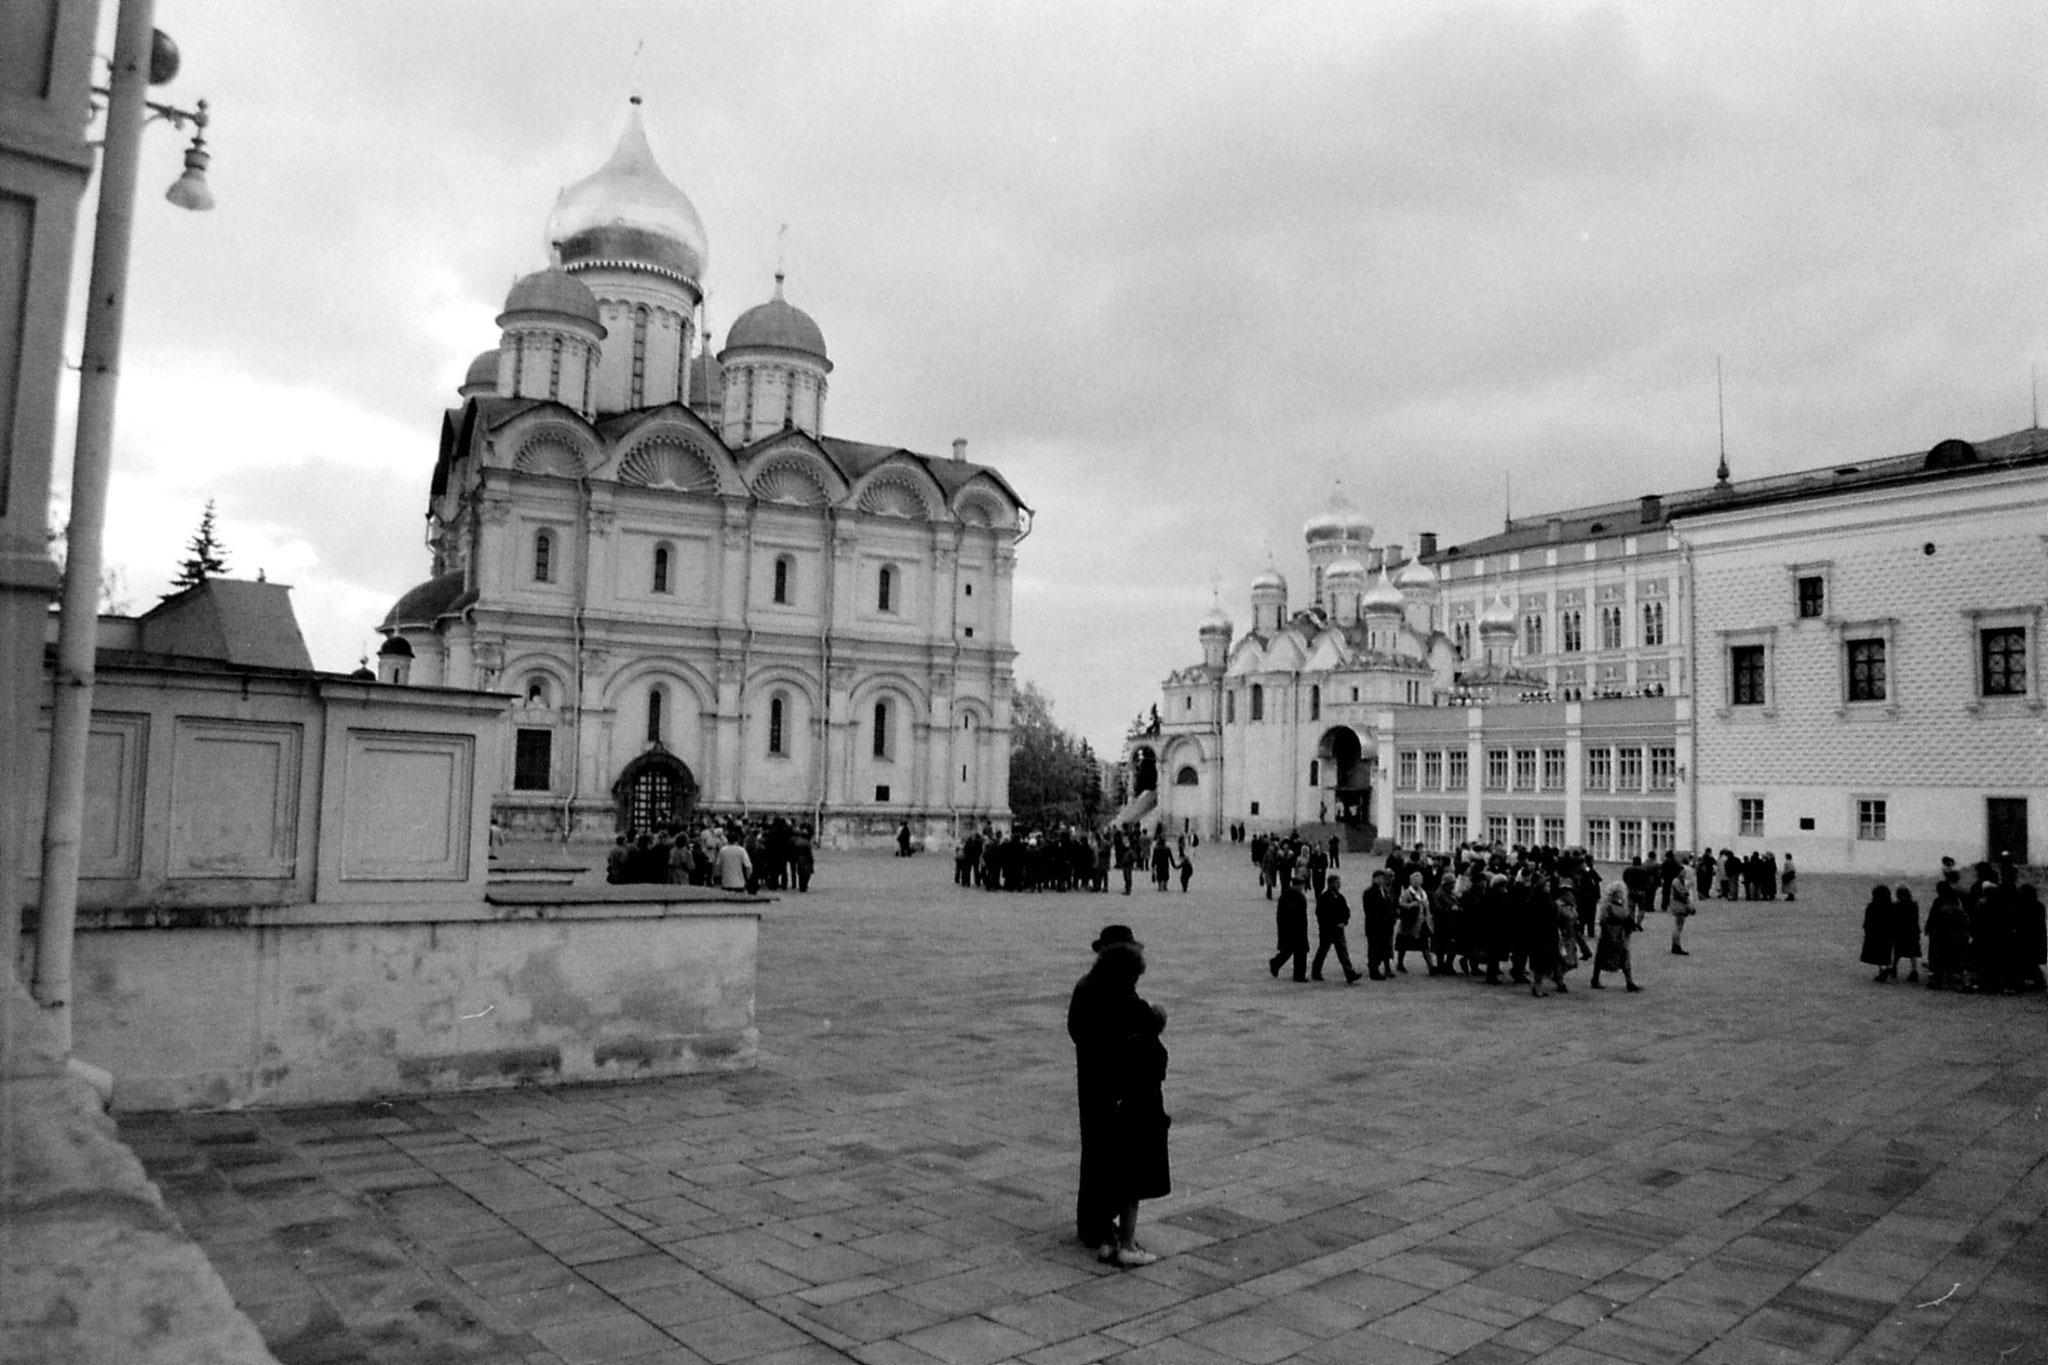 17/10/1988: 32: Kremlin cathedral square